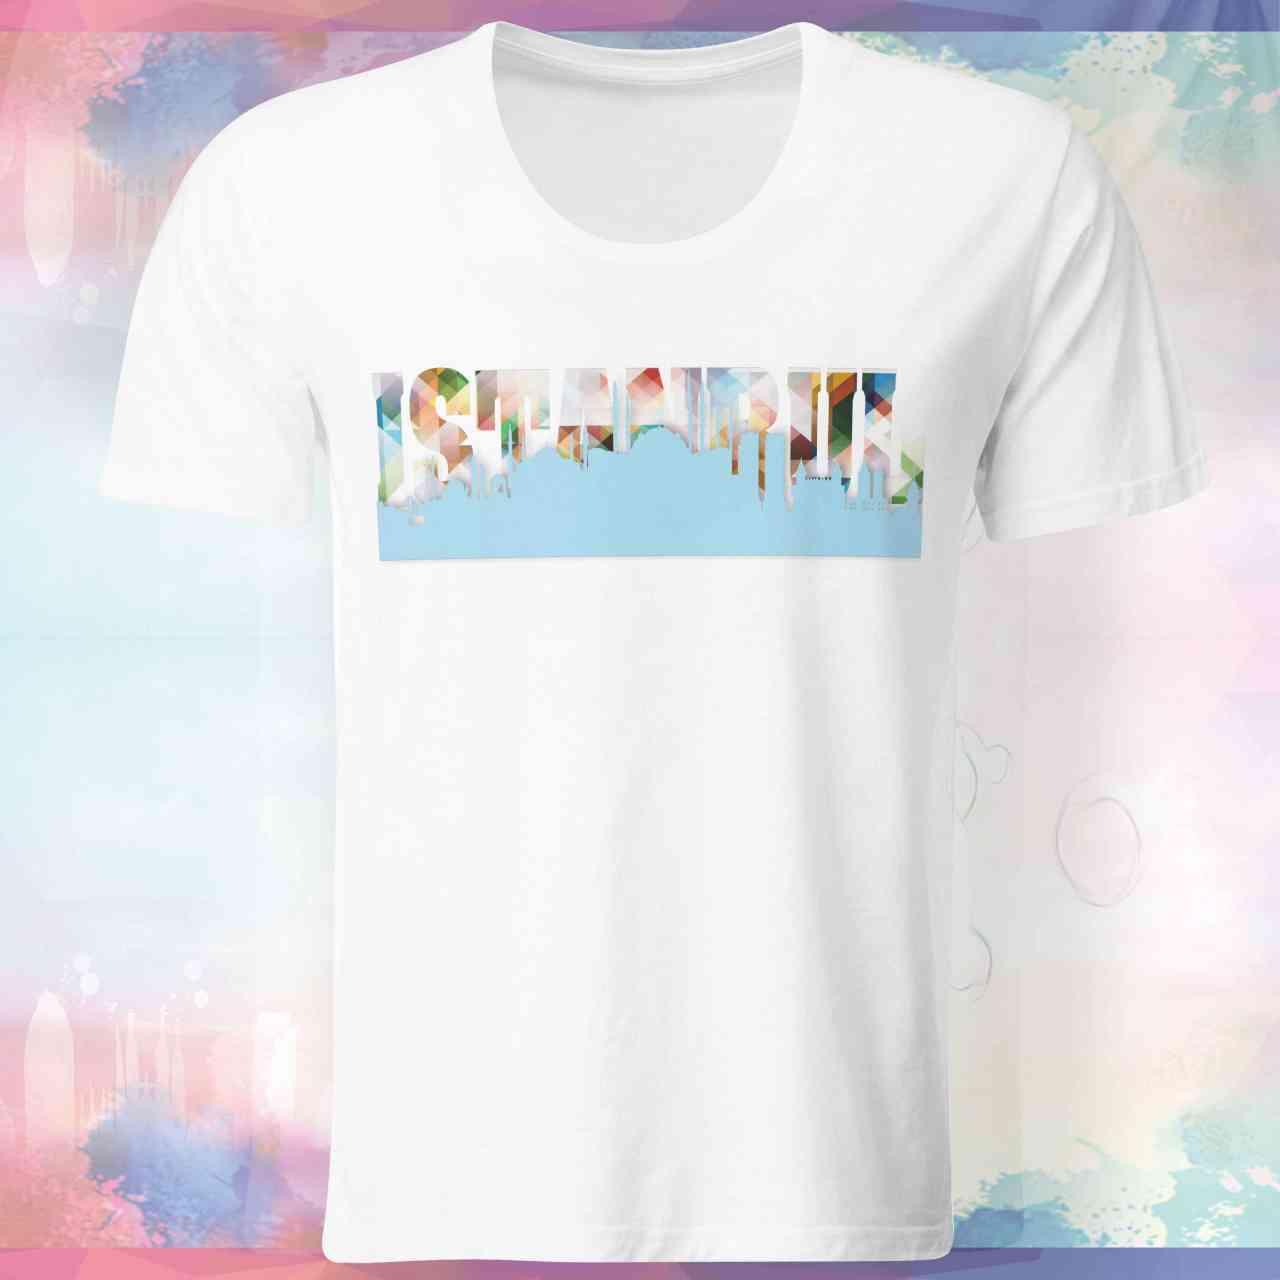 Istanbul Skyline Shirt | Istanbul Skyline T-Shirt | Istanbul Skyline Tshirt